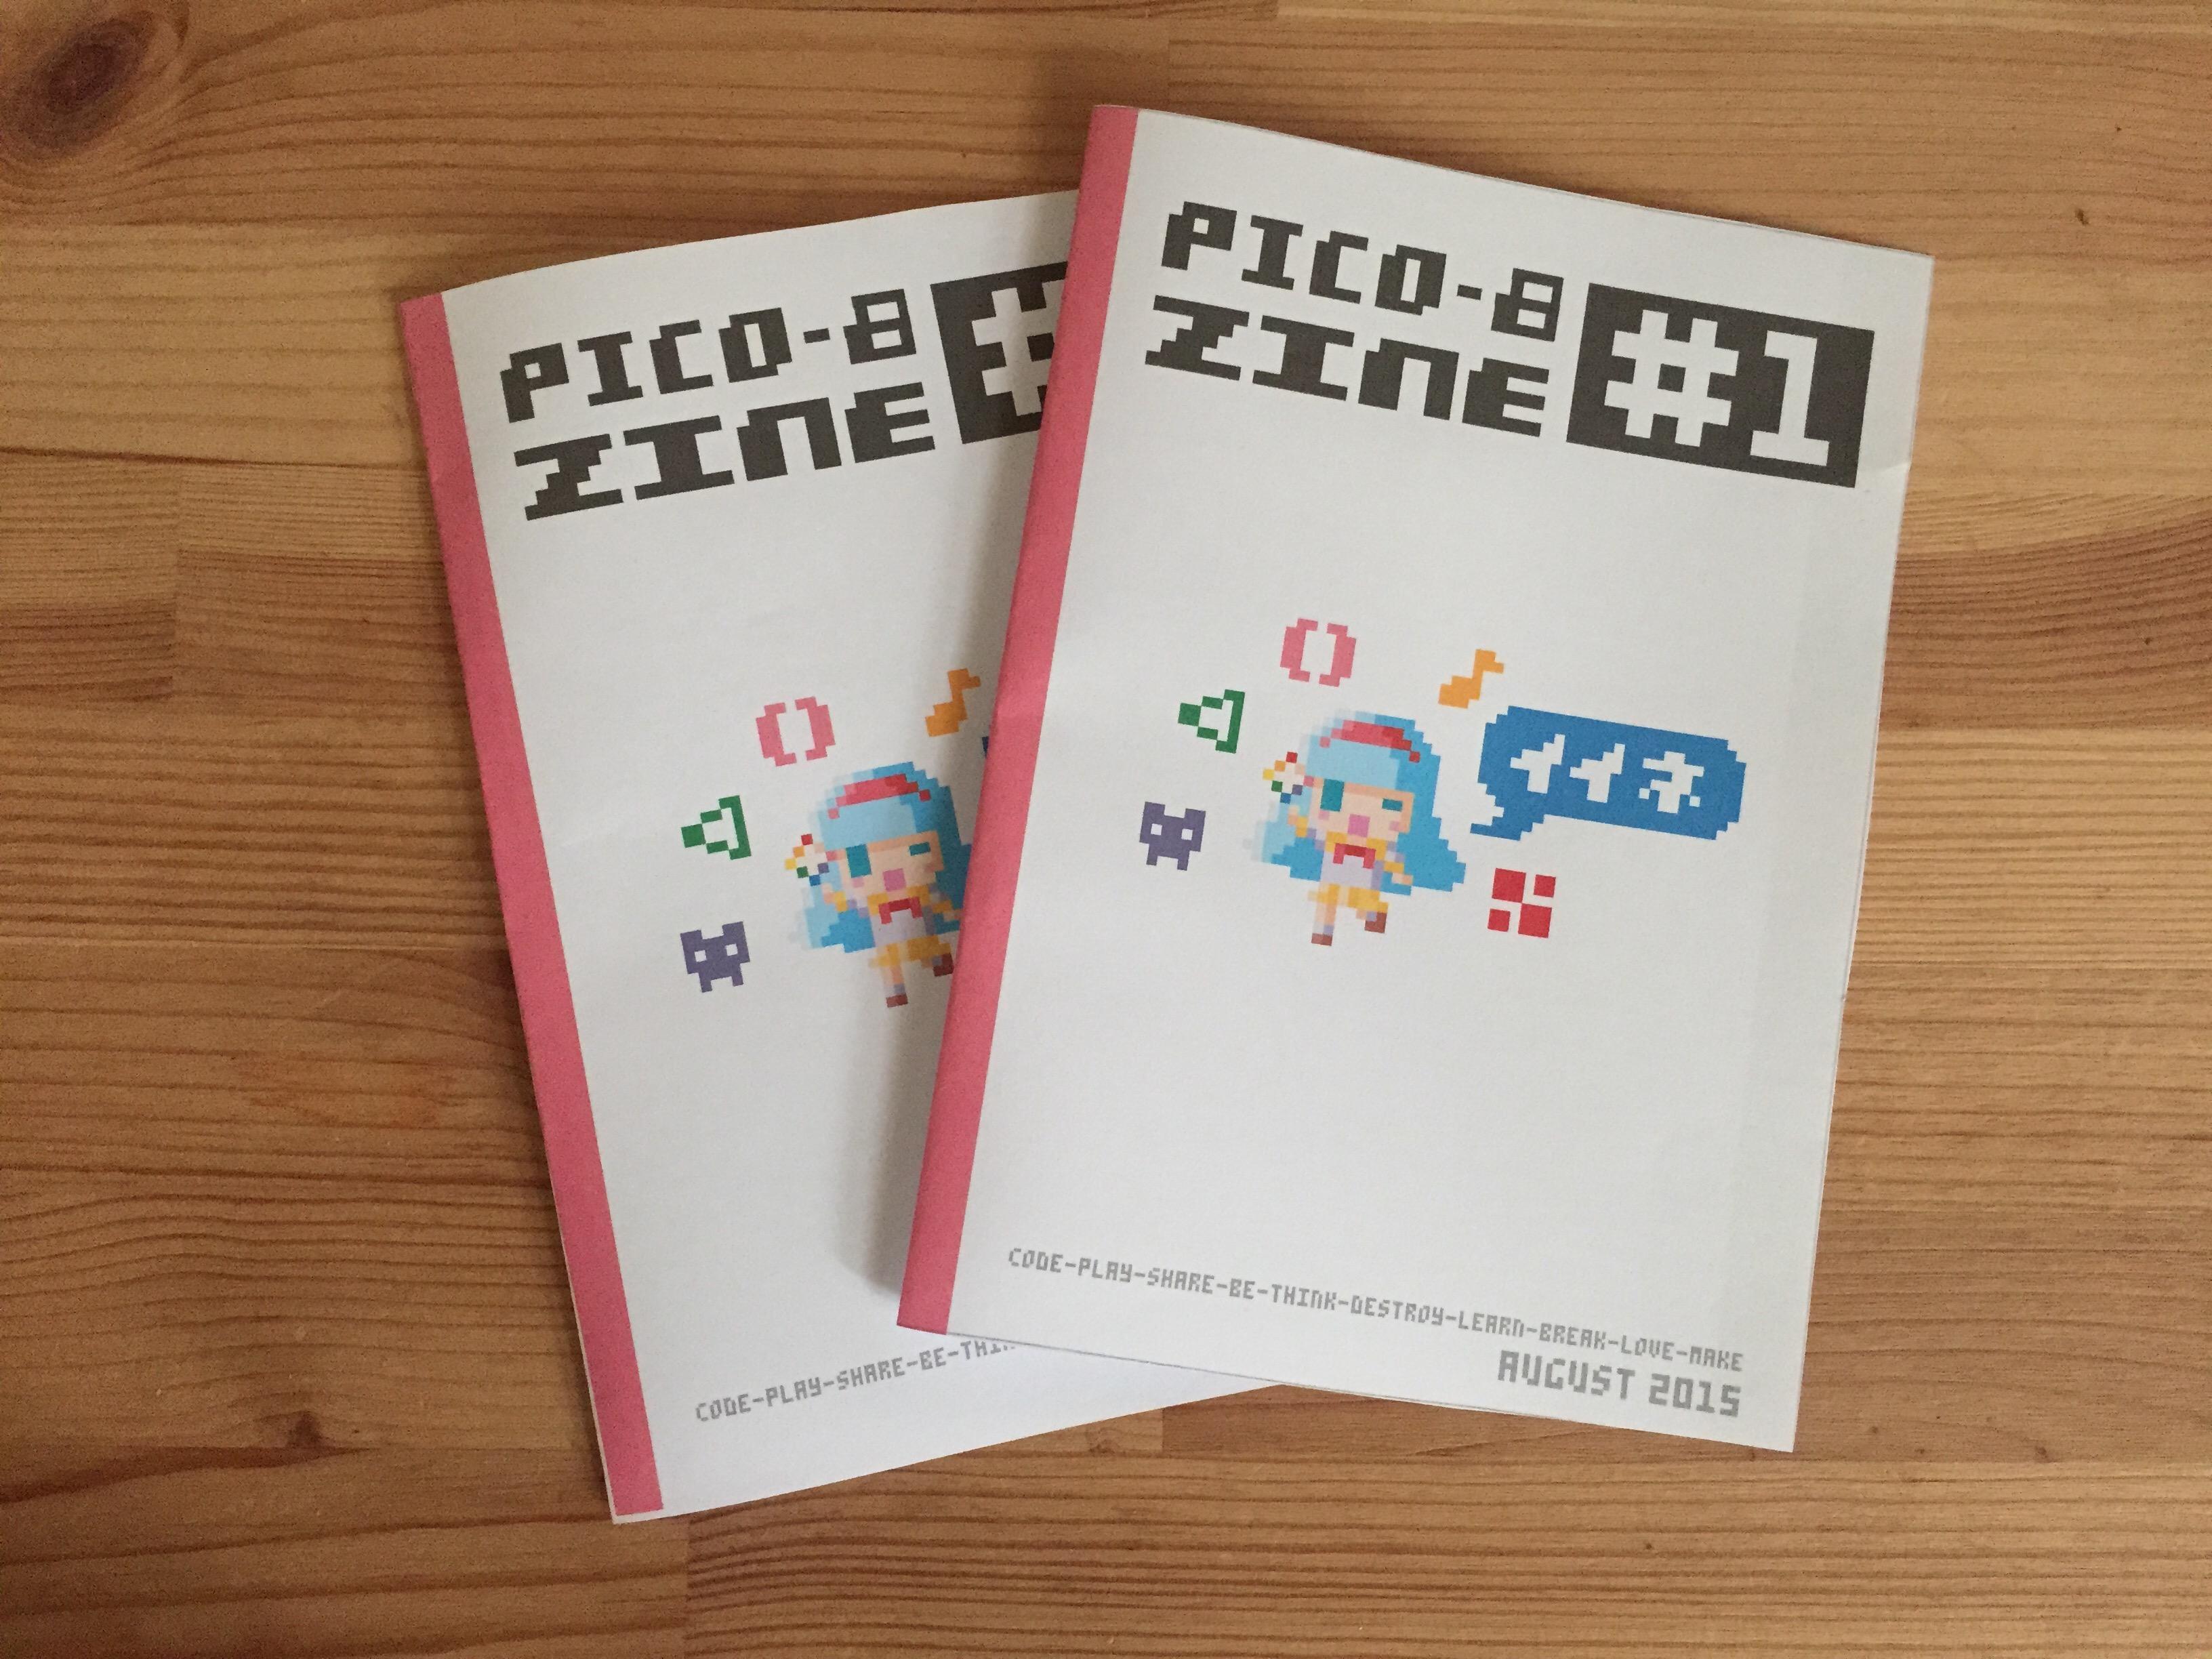 Pico-8 Fanzine  #1